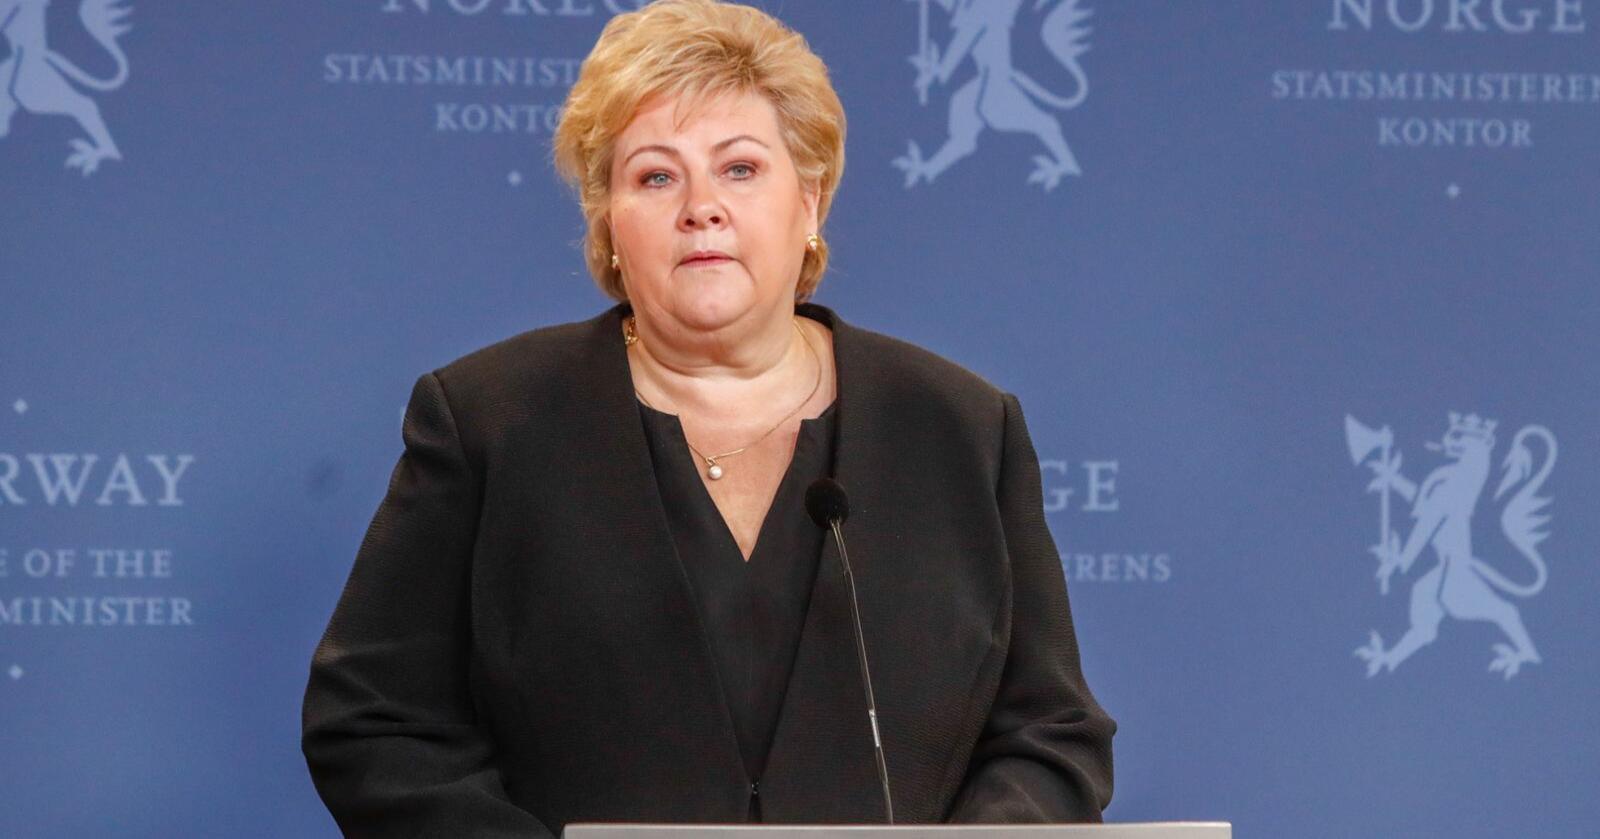 Statsminister Erna Solberg (H) holdt pressekonferanse etter statsråd på Slottet fredag. Foto: Terje Bendiksby / NTB scanpix